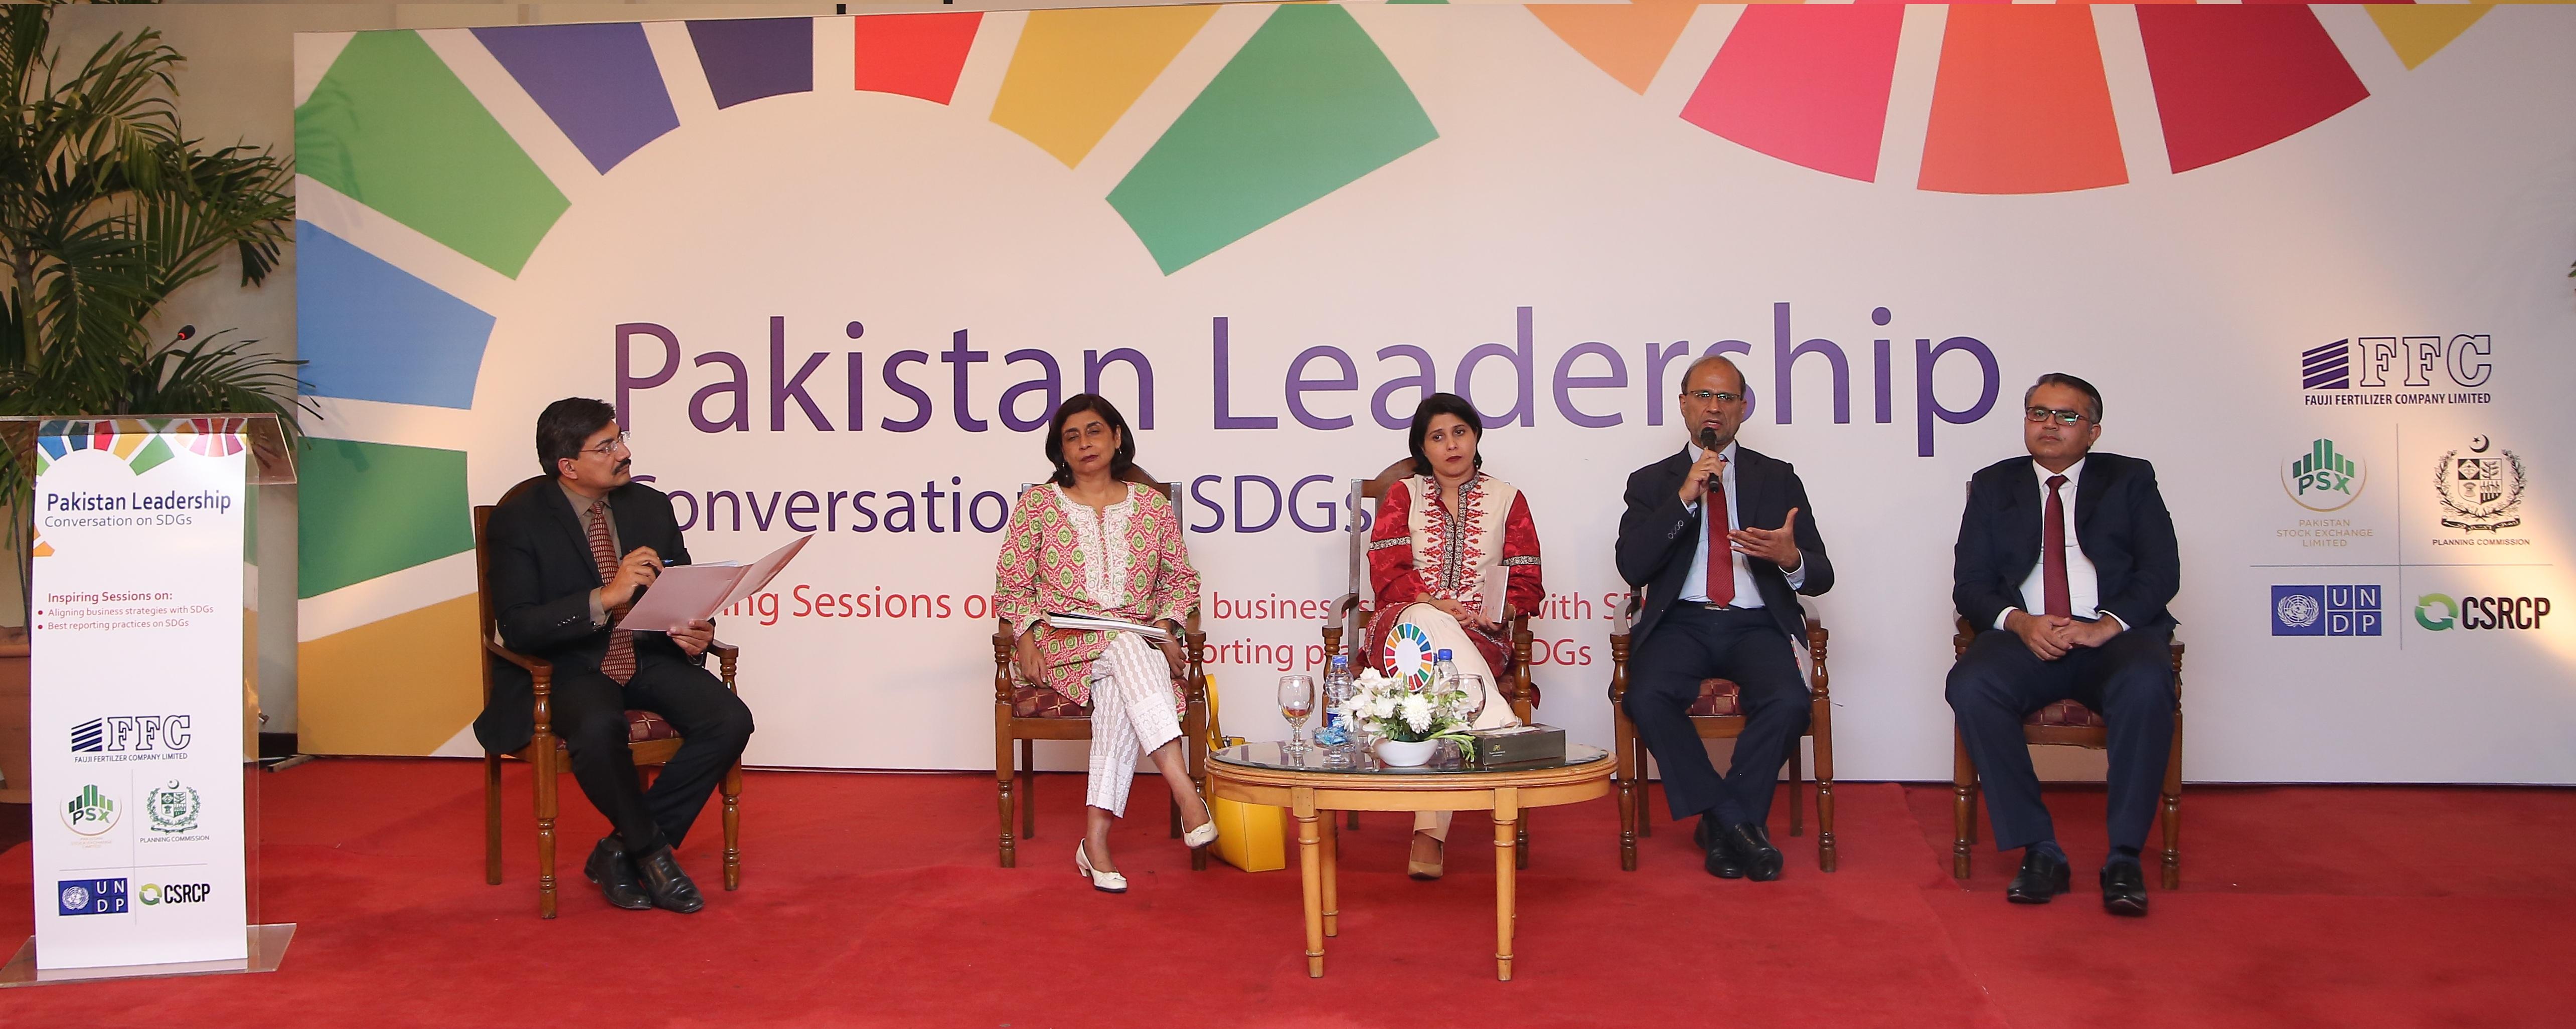 Leadership Conversation